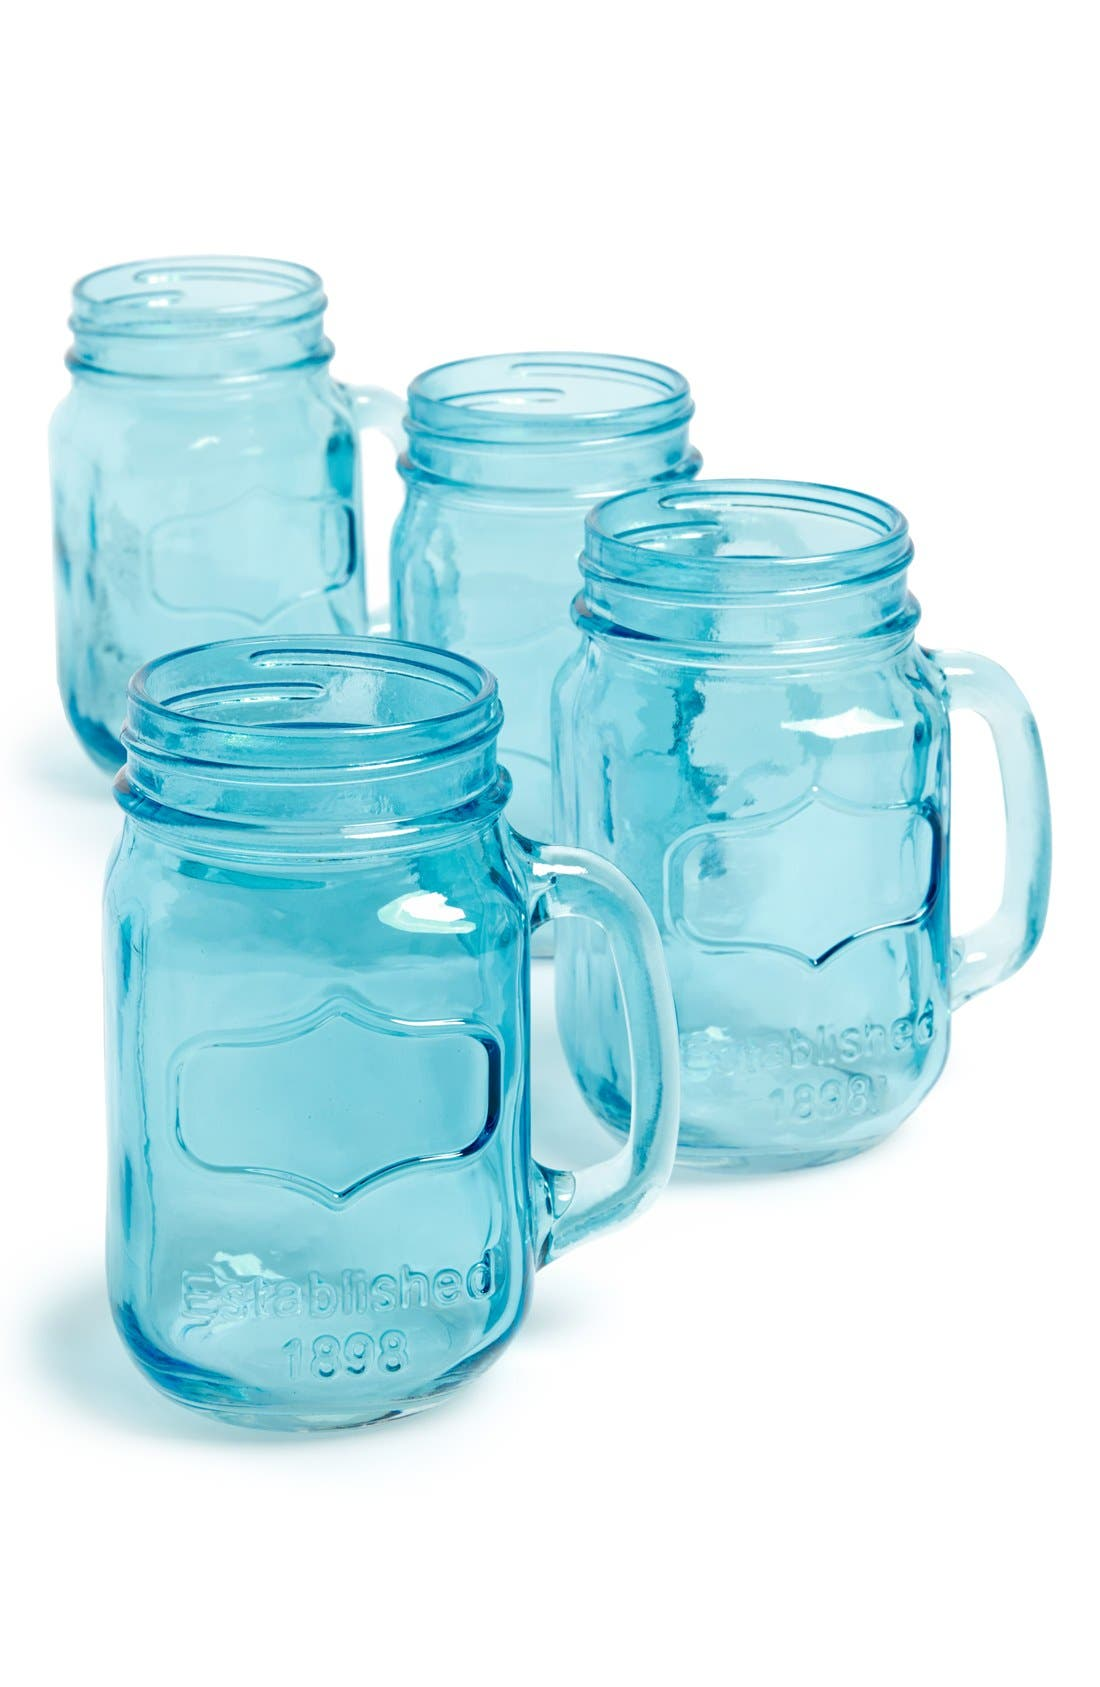 Main Image - Circle Glass 'Yorkshire' Mason Jar Mugs (Set of 4)